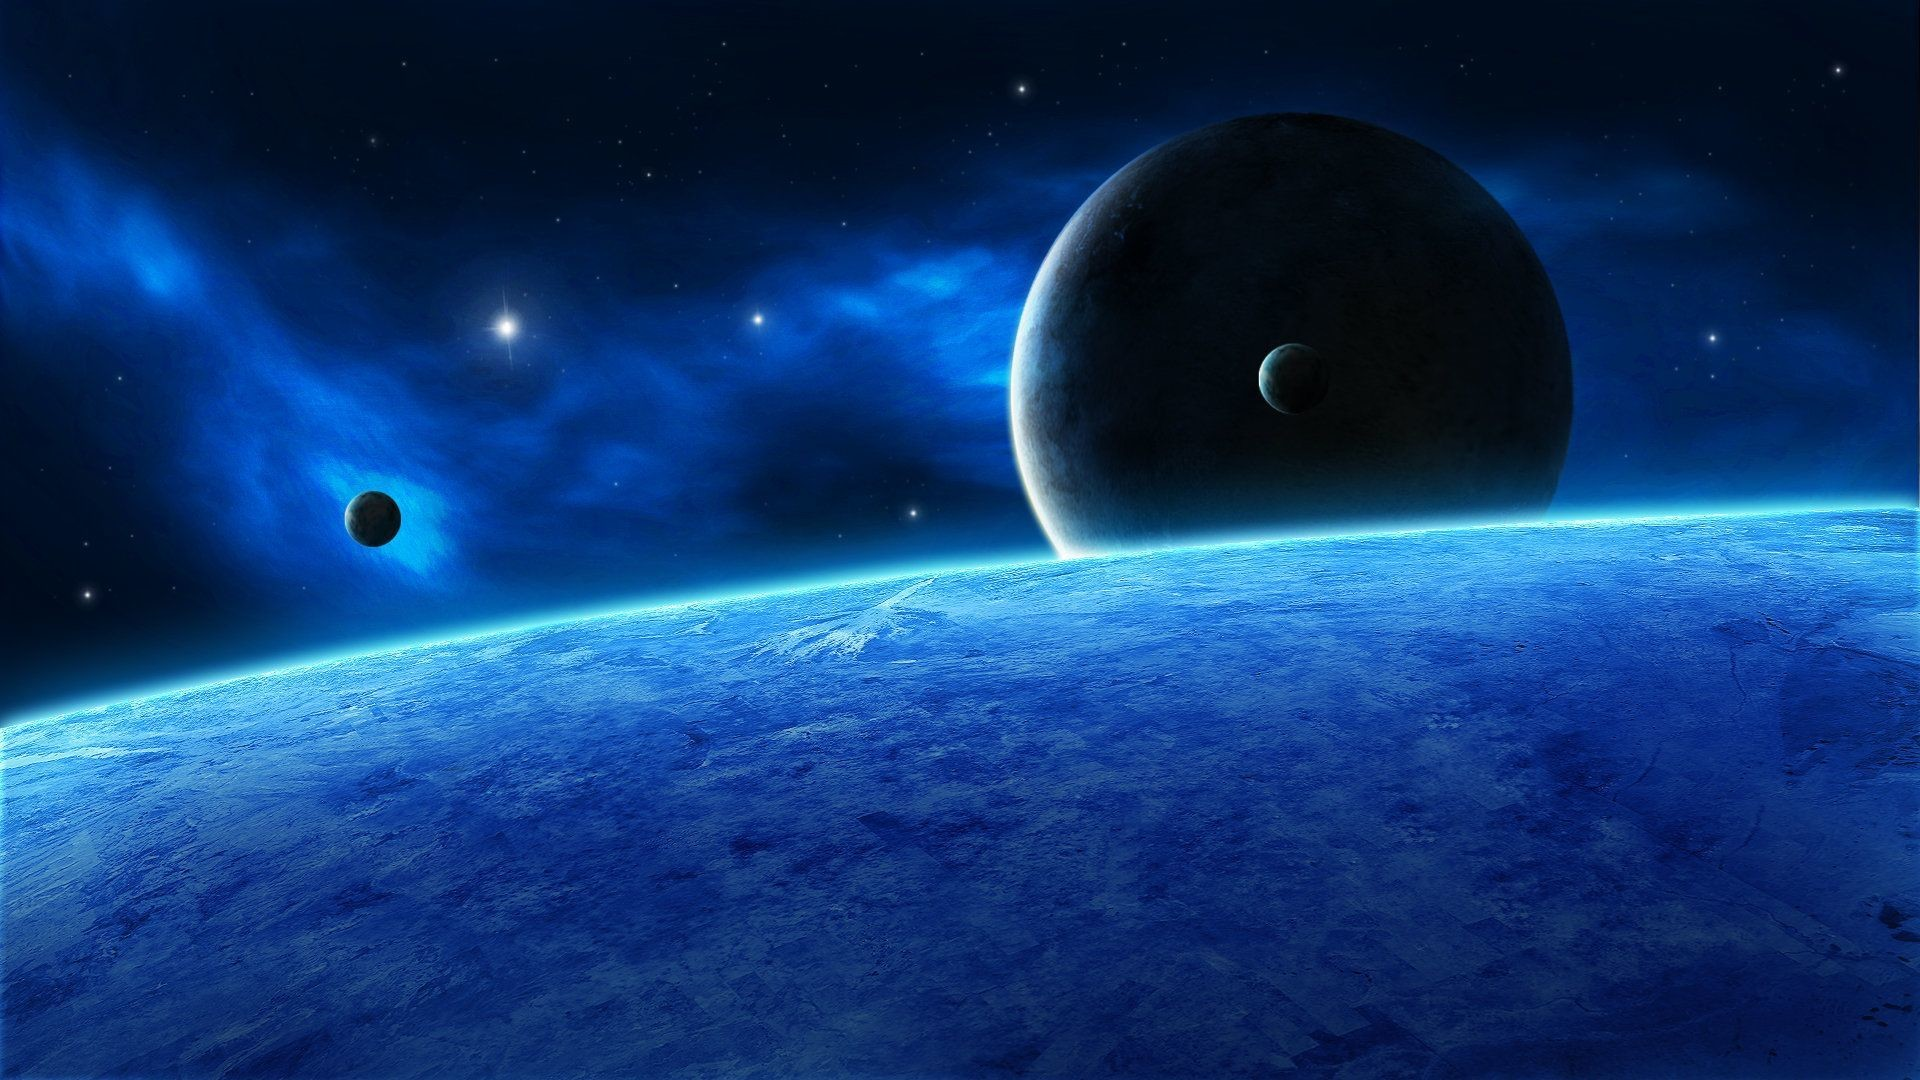 Blue space Wallpaper #35493